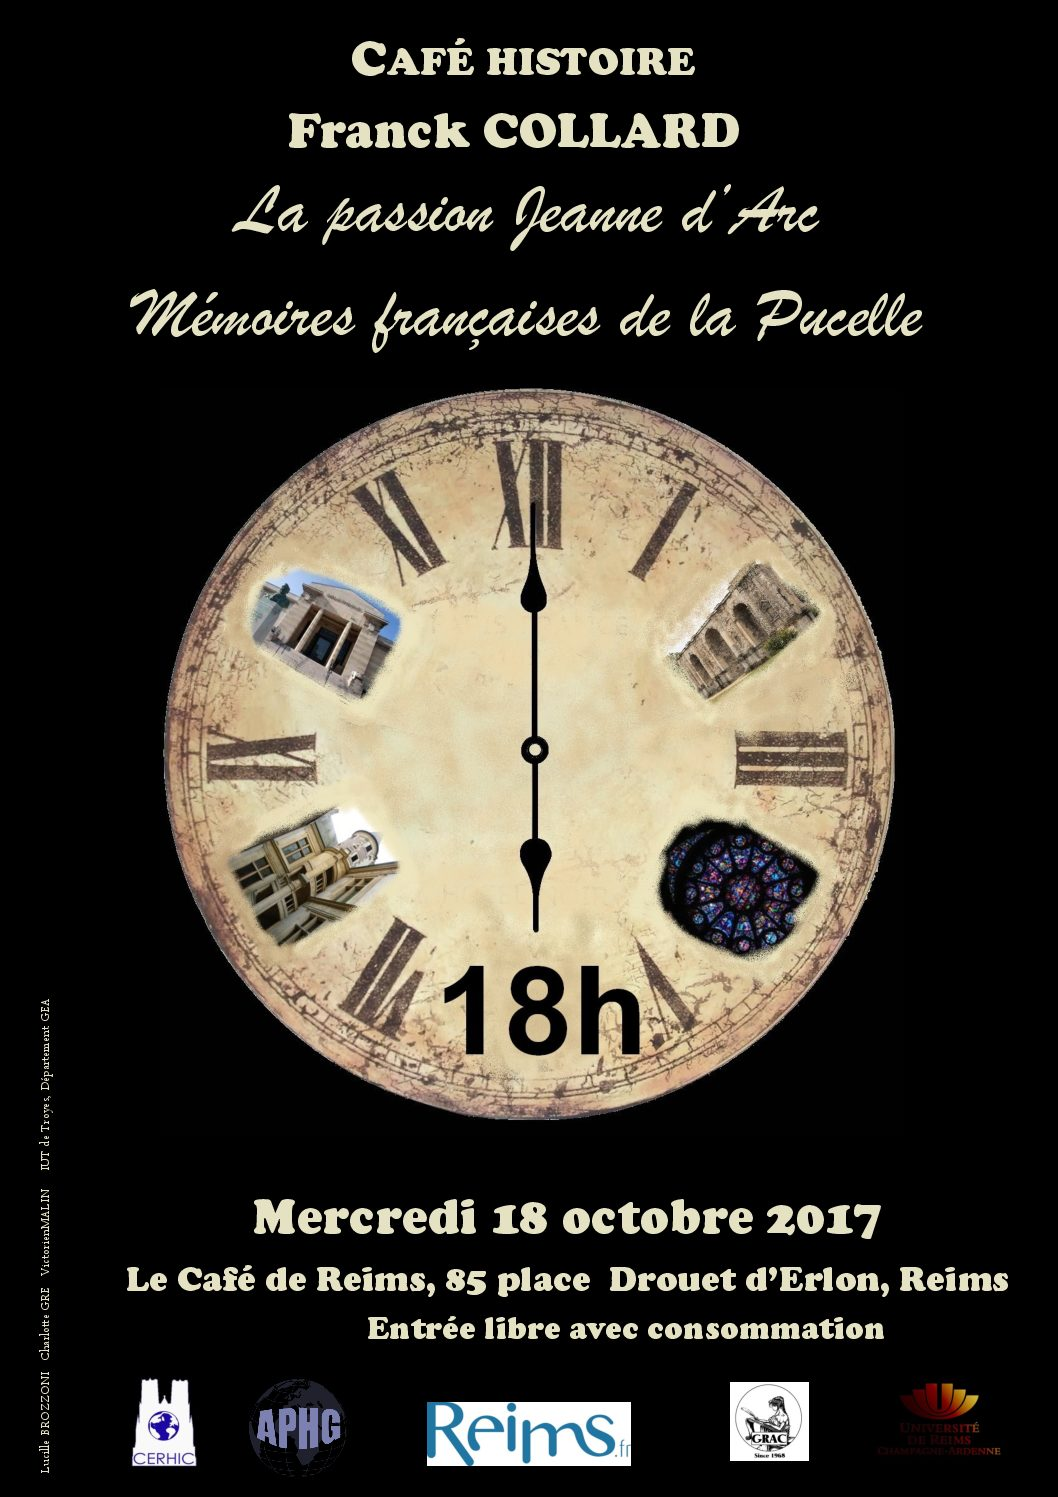 Café Histoire, mercredi 18 oct. 2017 : Franck Collard